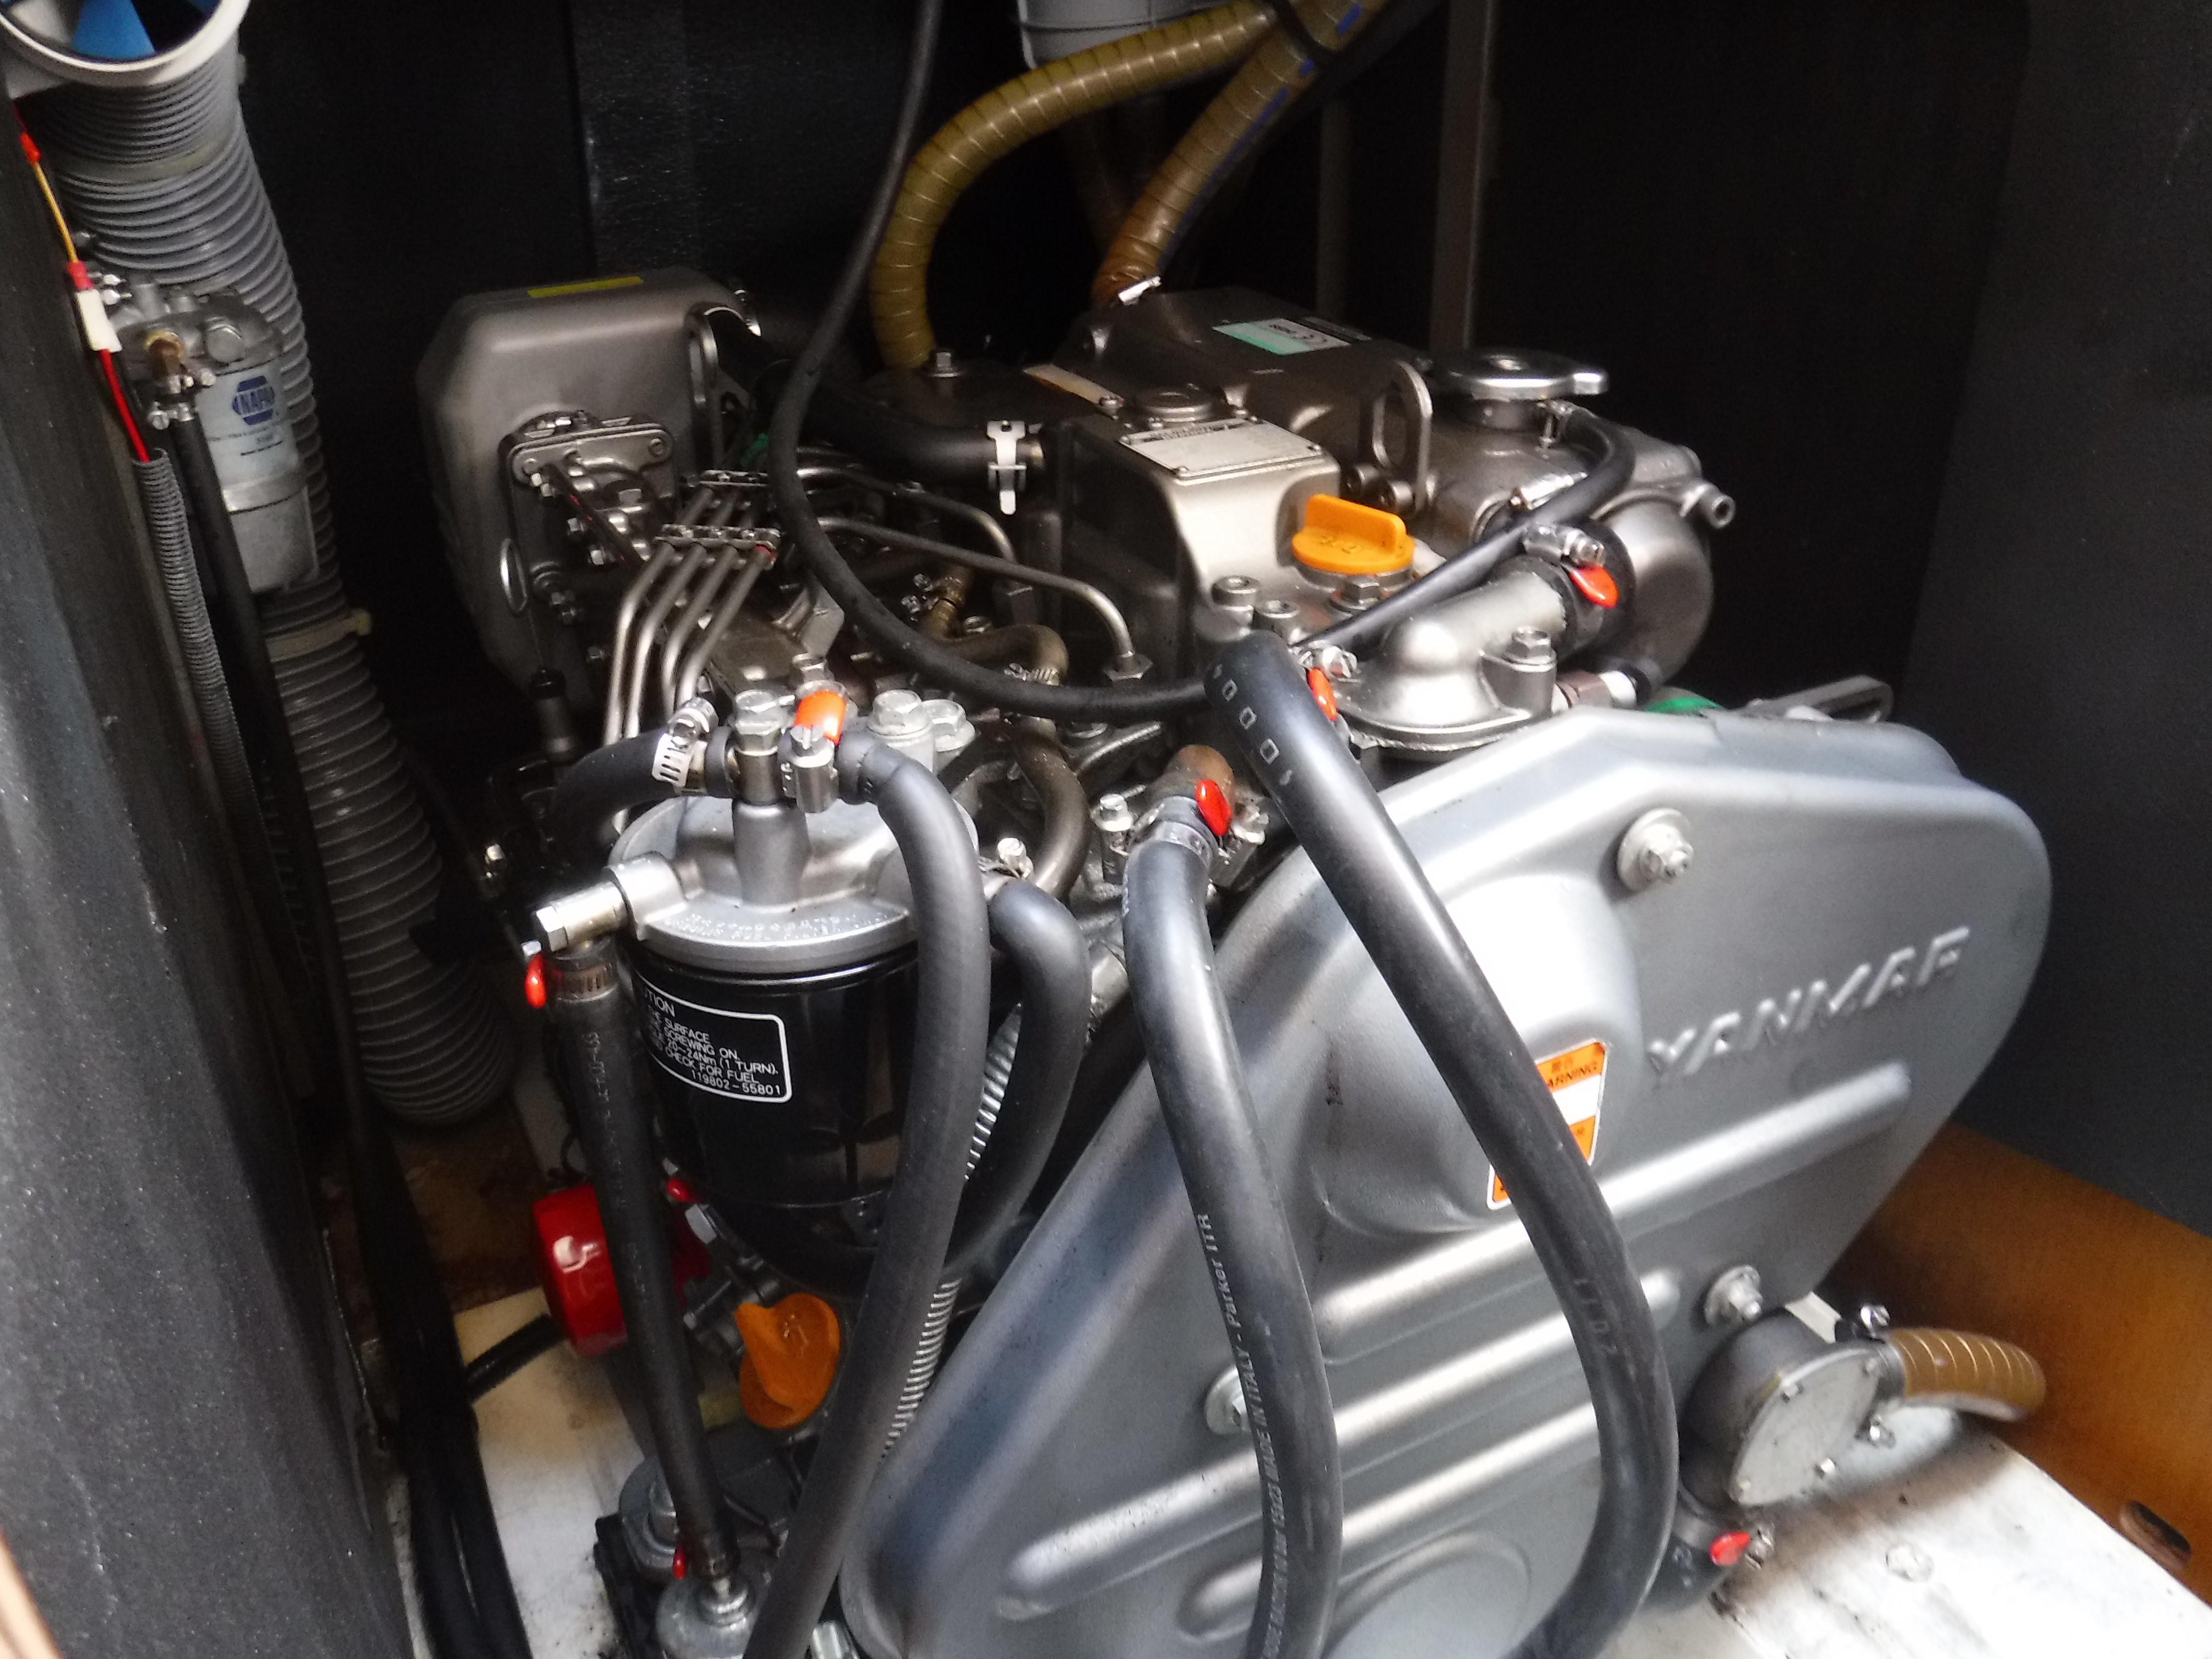 Engine access